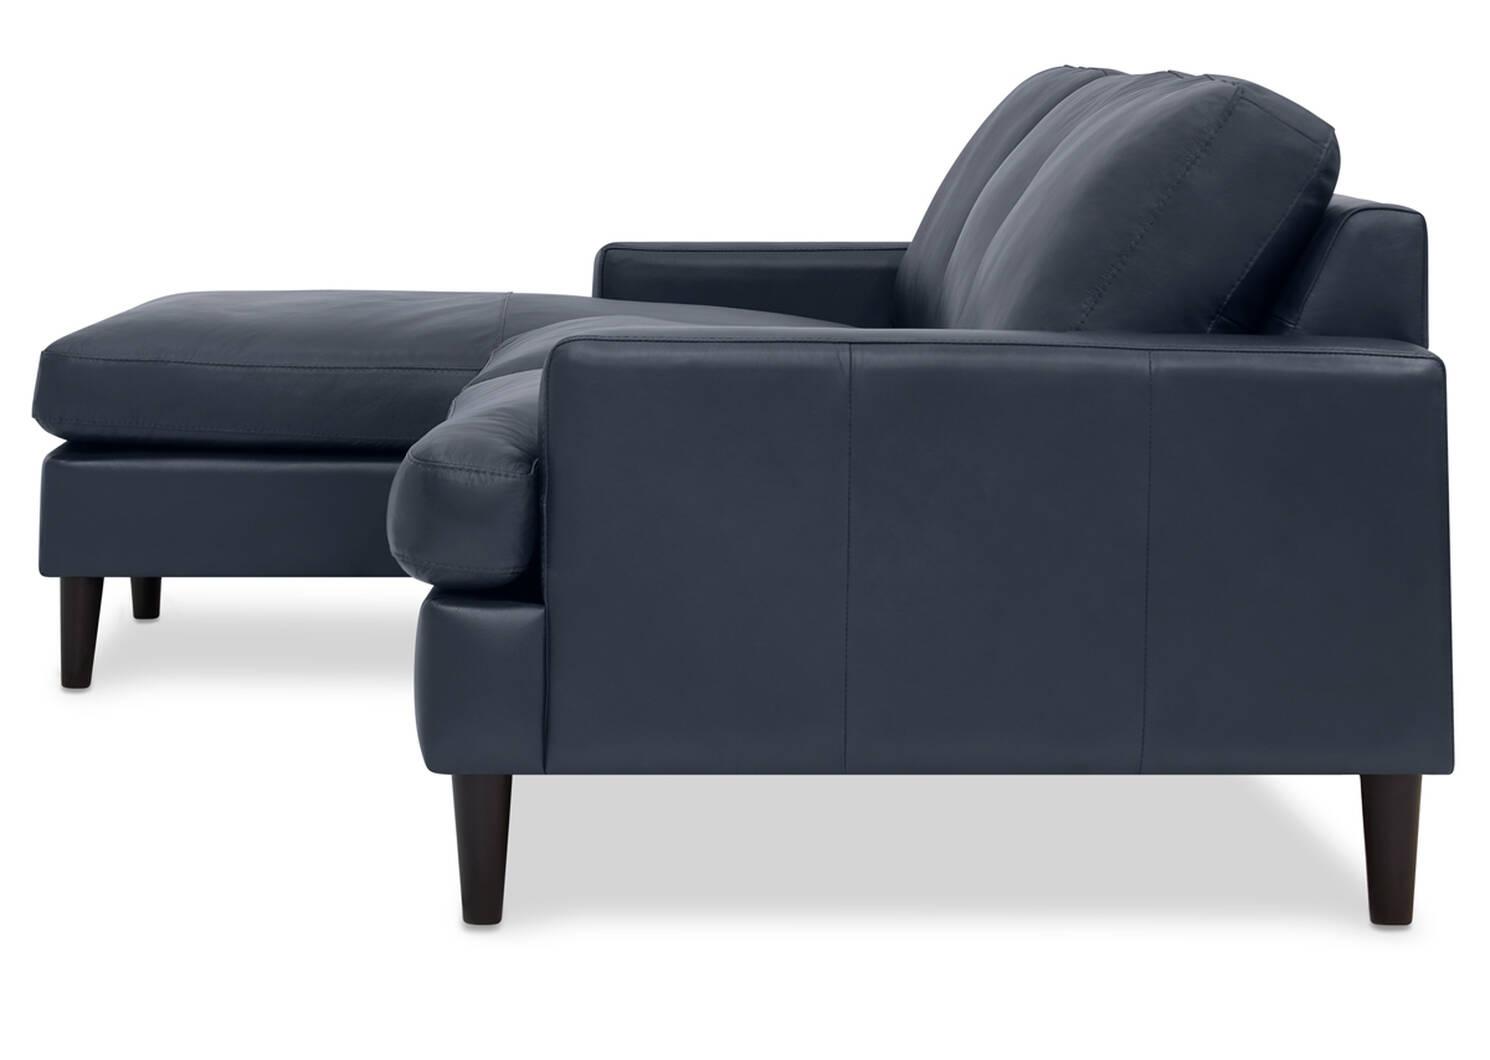 Savoy Custom Leather Sofa Chaise